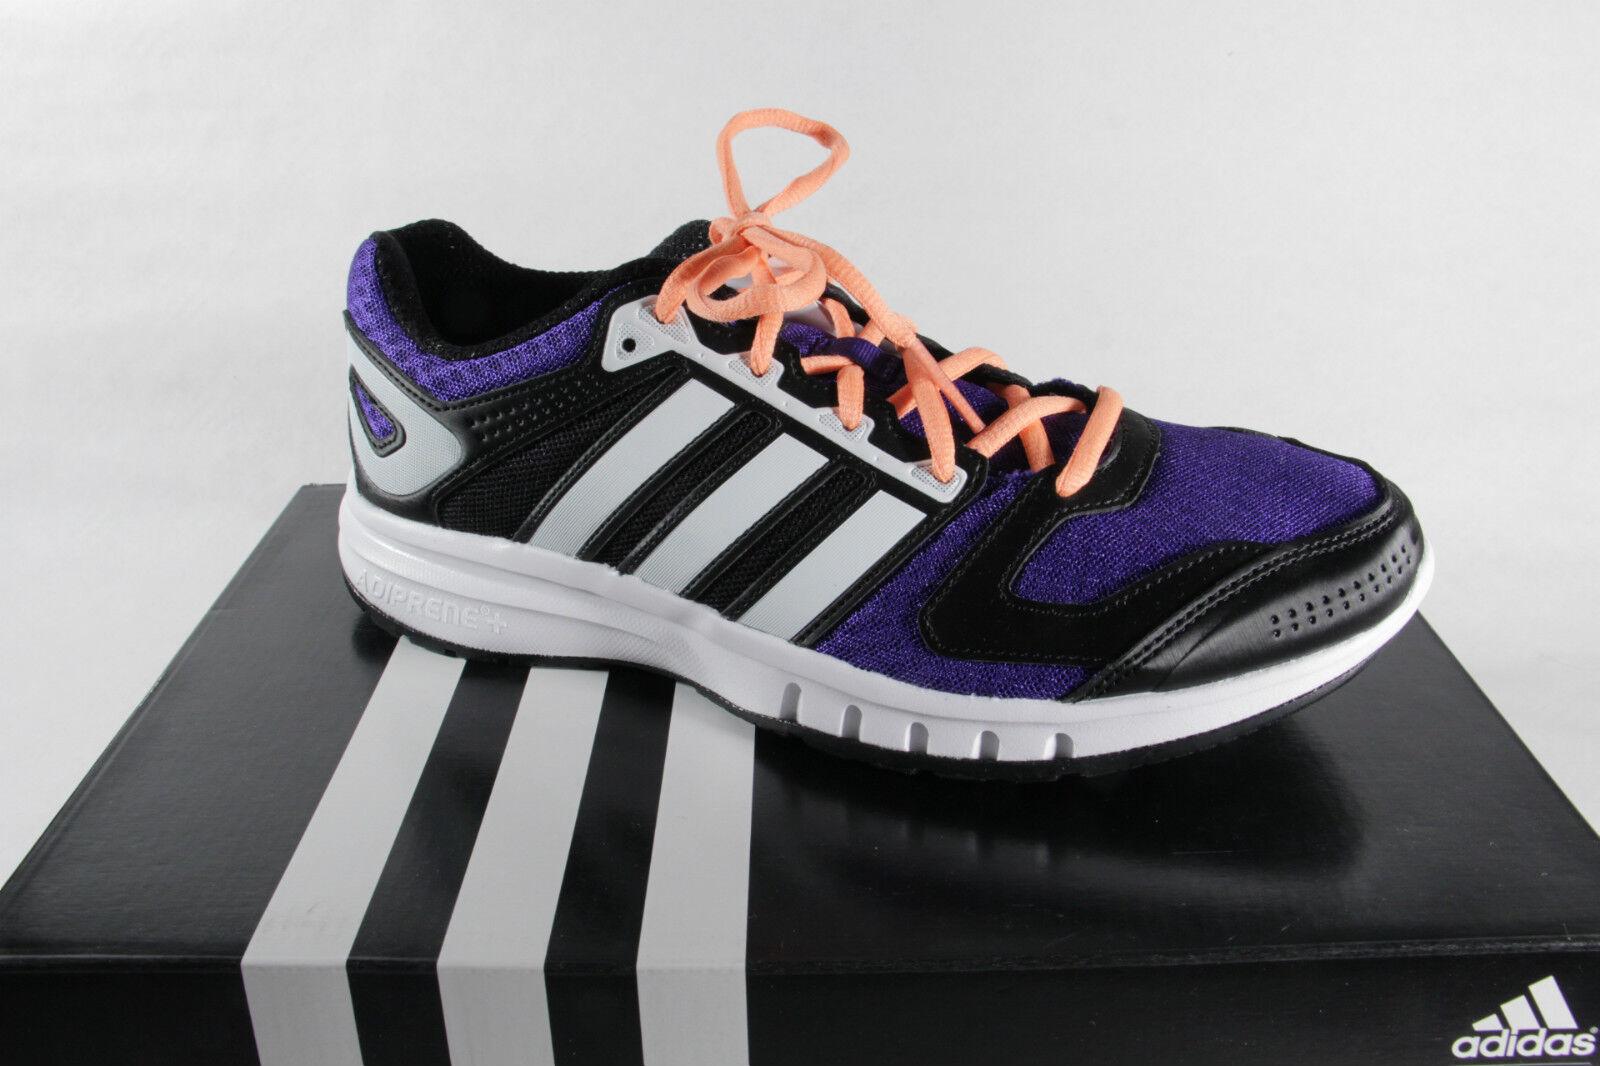 Adidas Galaxy Női Lace-up Cipők Futócipő ÚJ